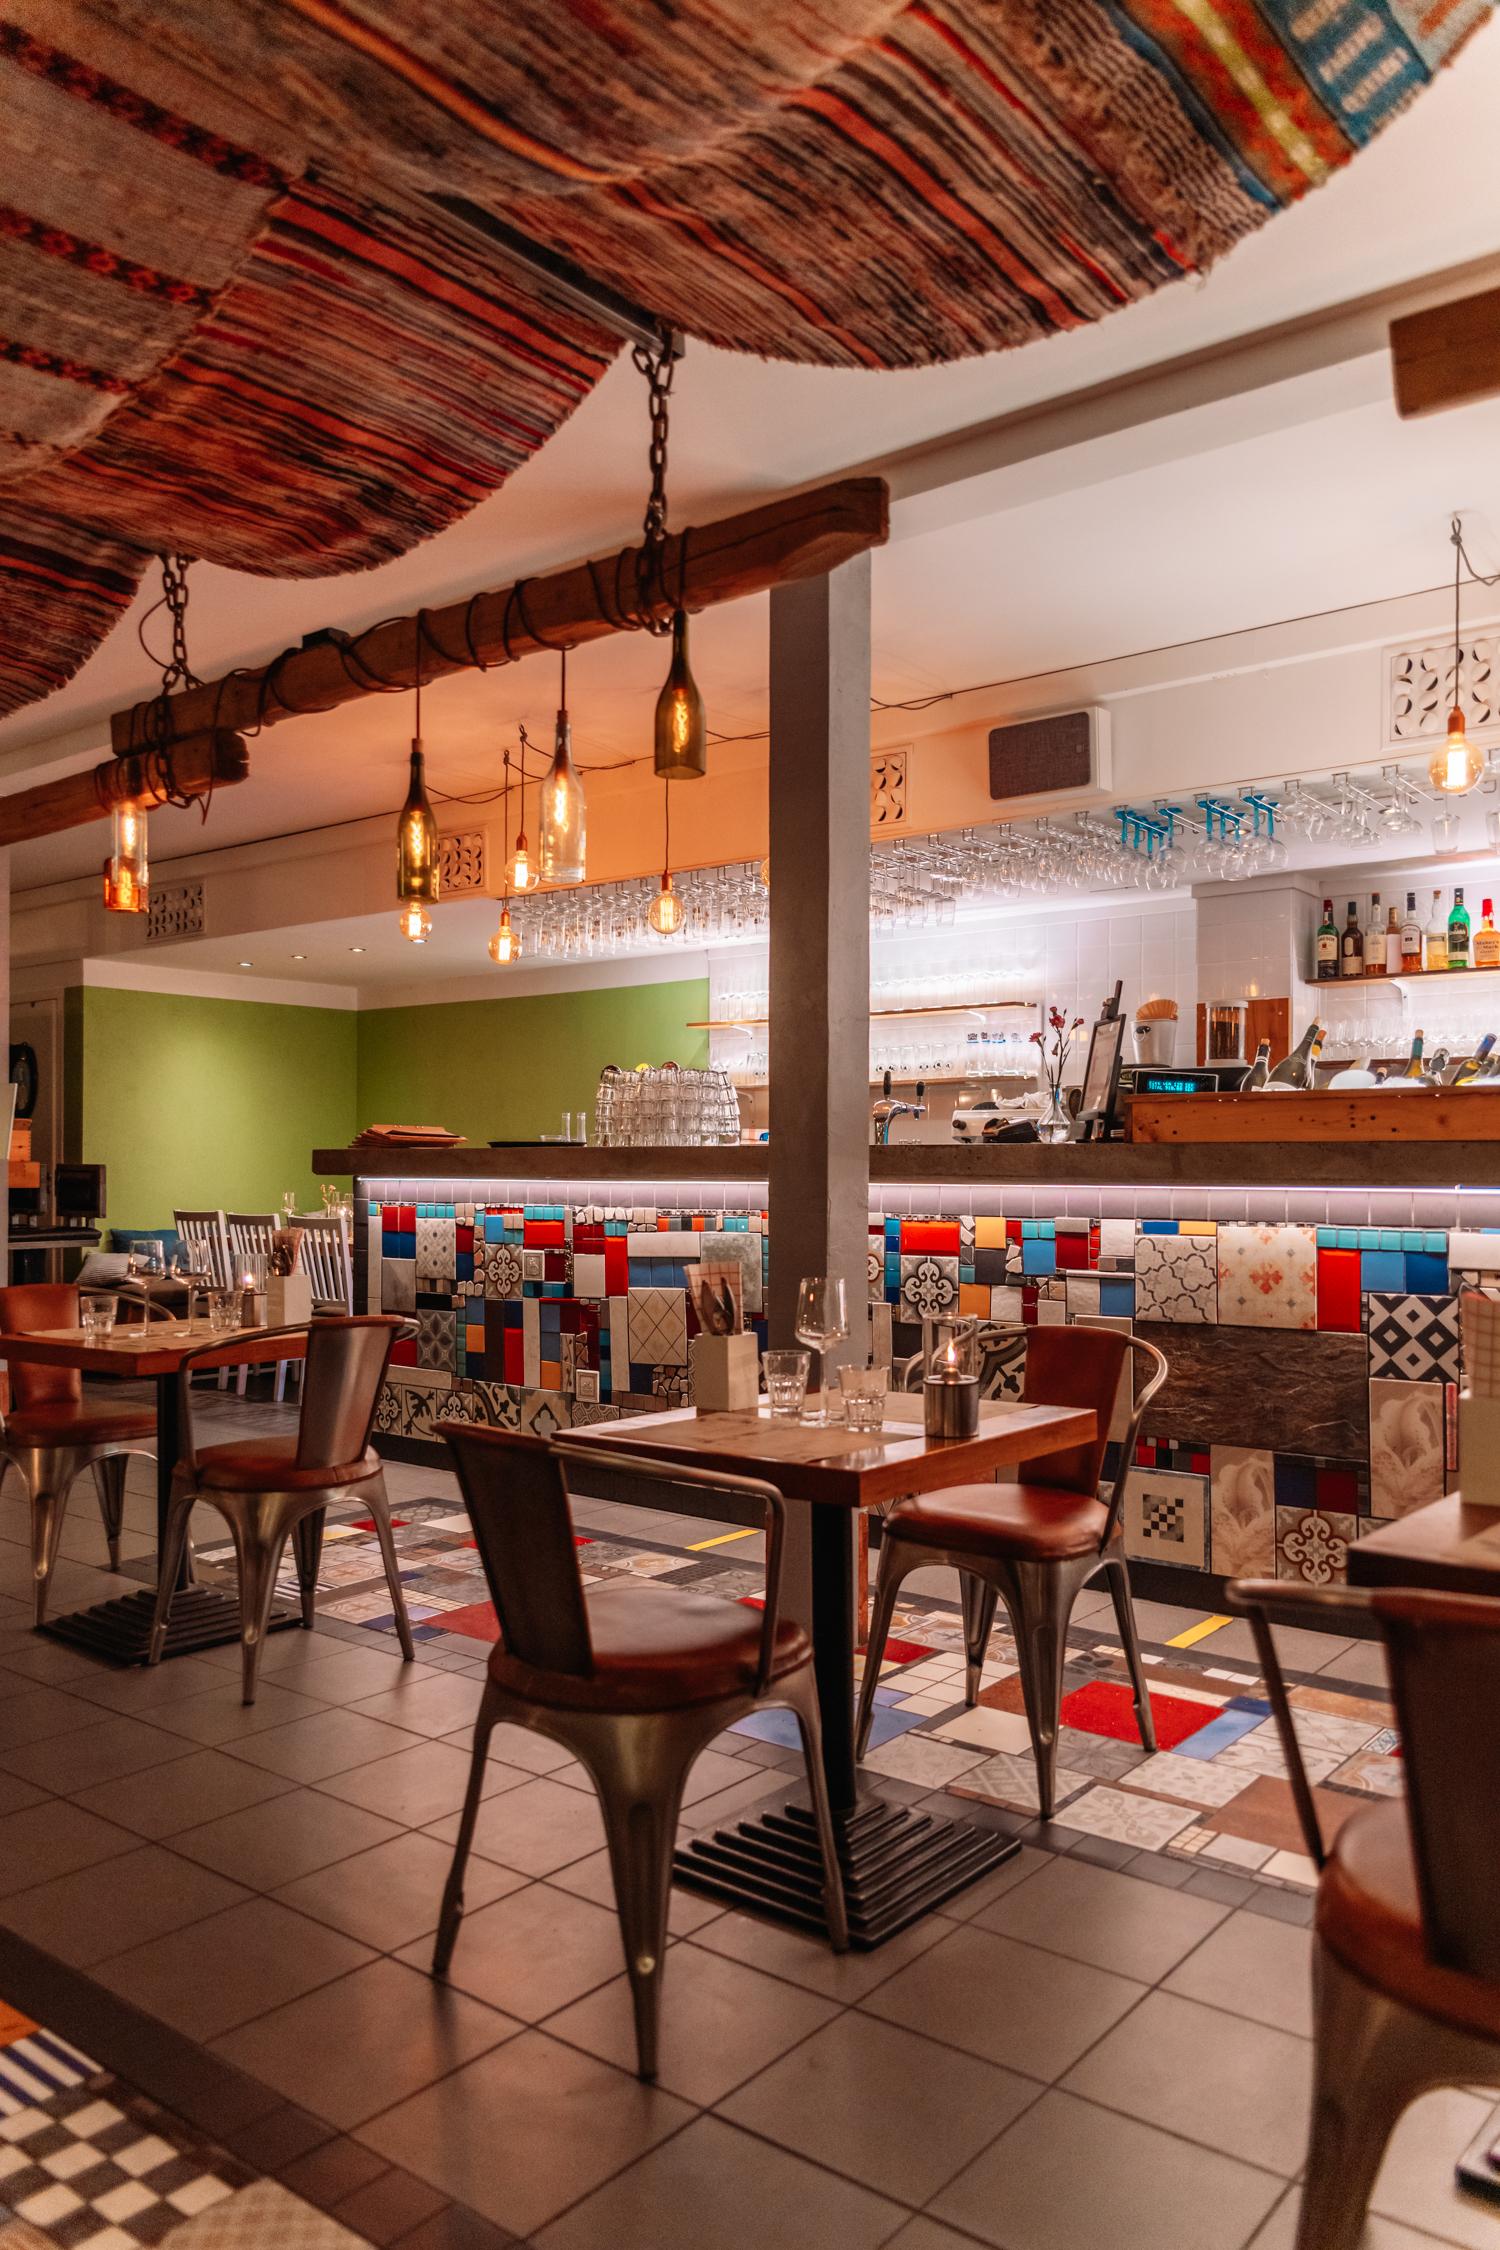 Klimatsmart restaurang i Örebro: Matbaren Gro på Stallbacken